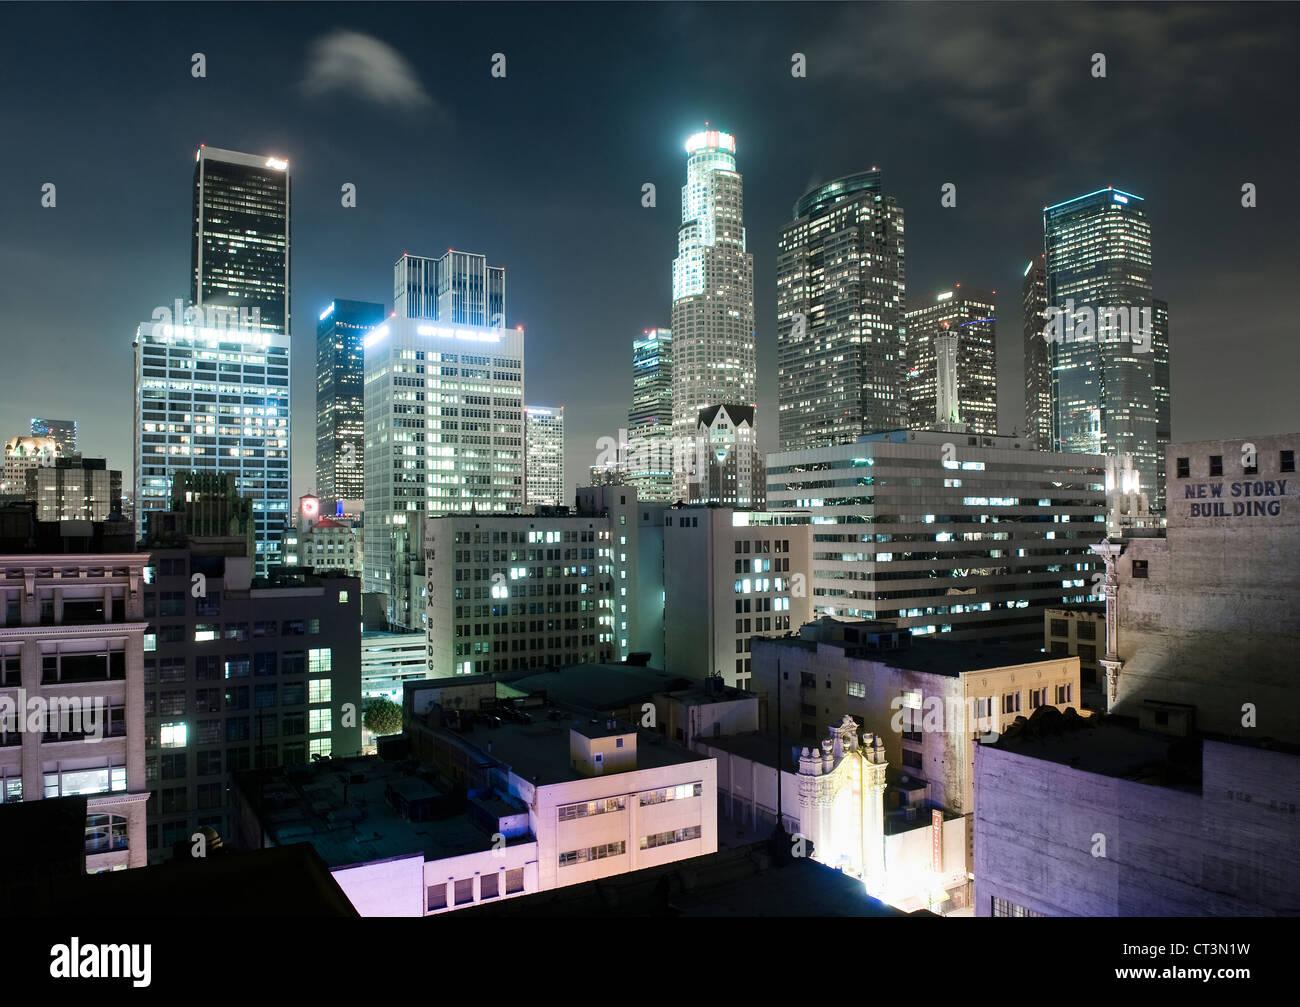 Los Angeles gratte-ciel lit up at night Photo Stock